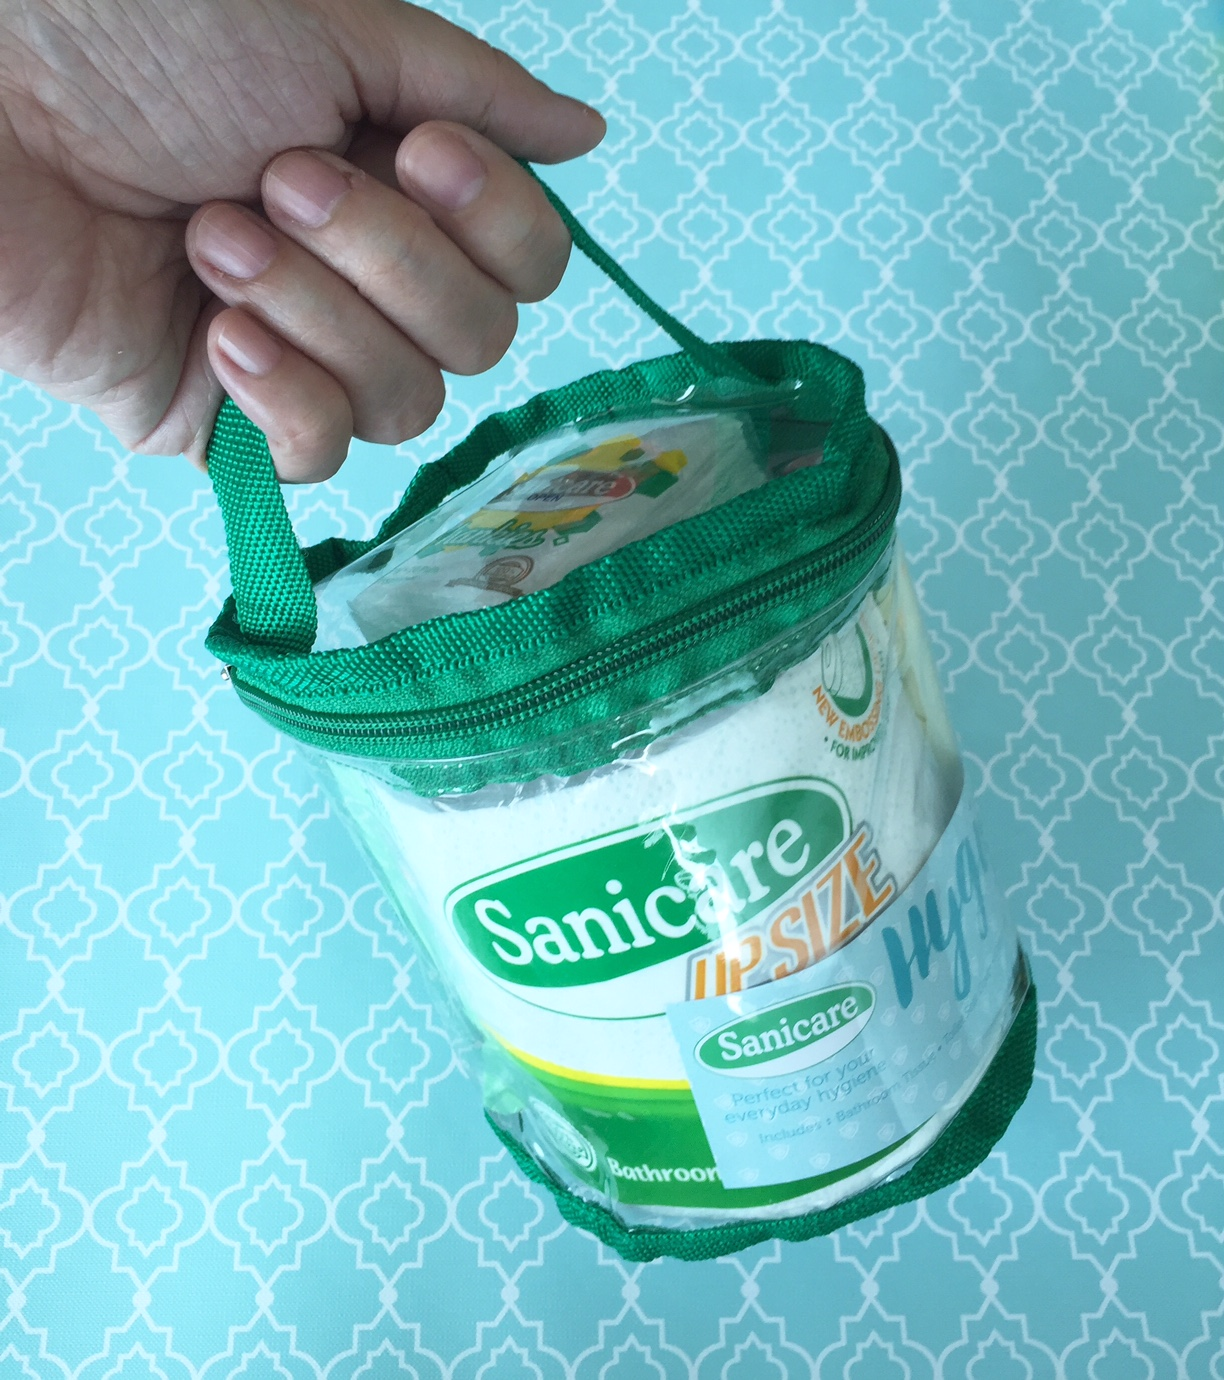 Dish Towel Synonym: Review: Sanicare Hygiene Kit